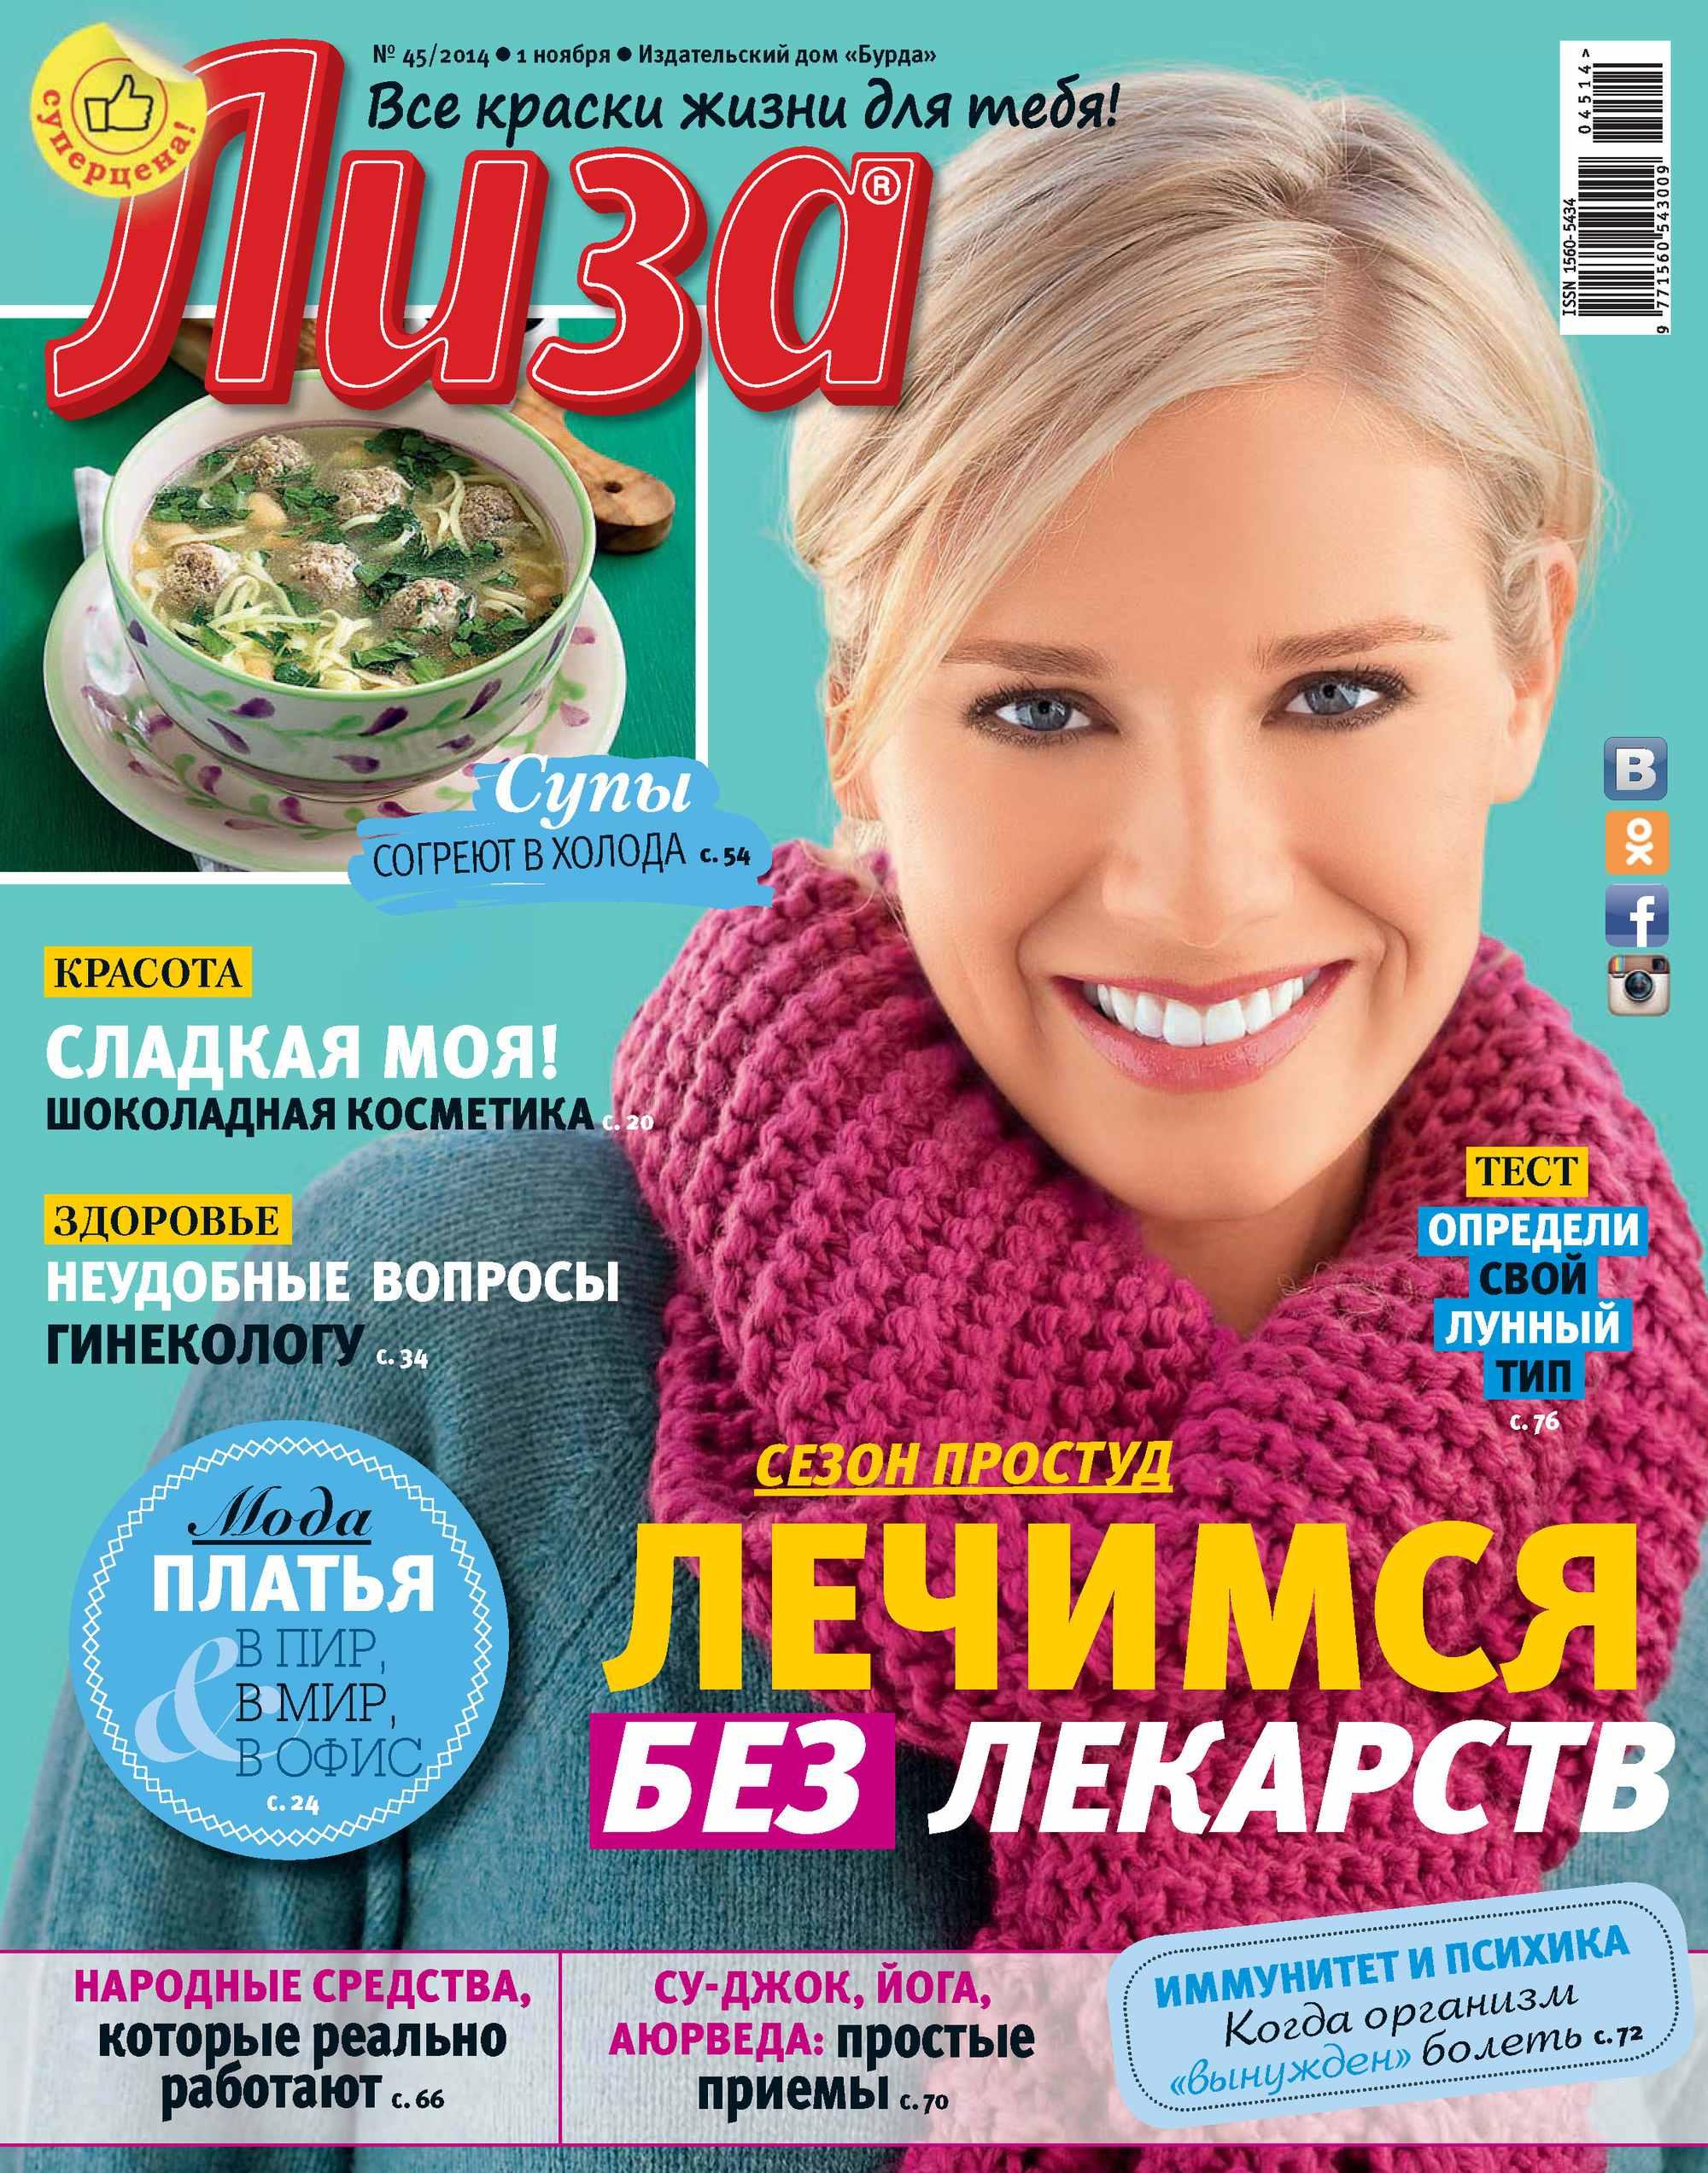 ИД «Бурда» Журнал «Лиза» №45/2014 ид бурда журнал лиза 38 2014